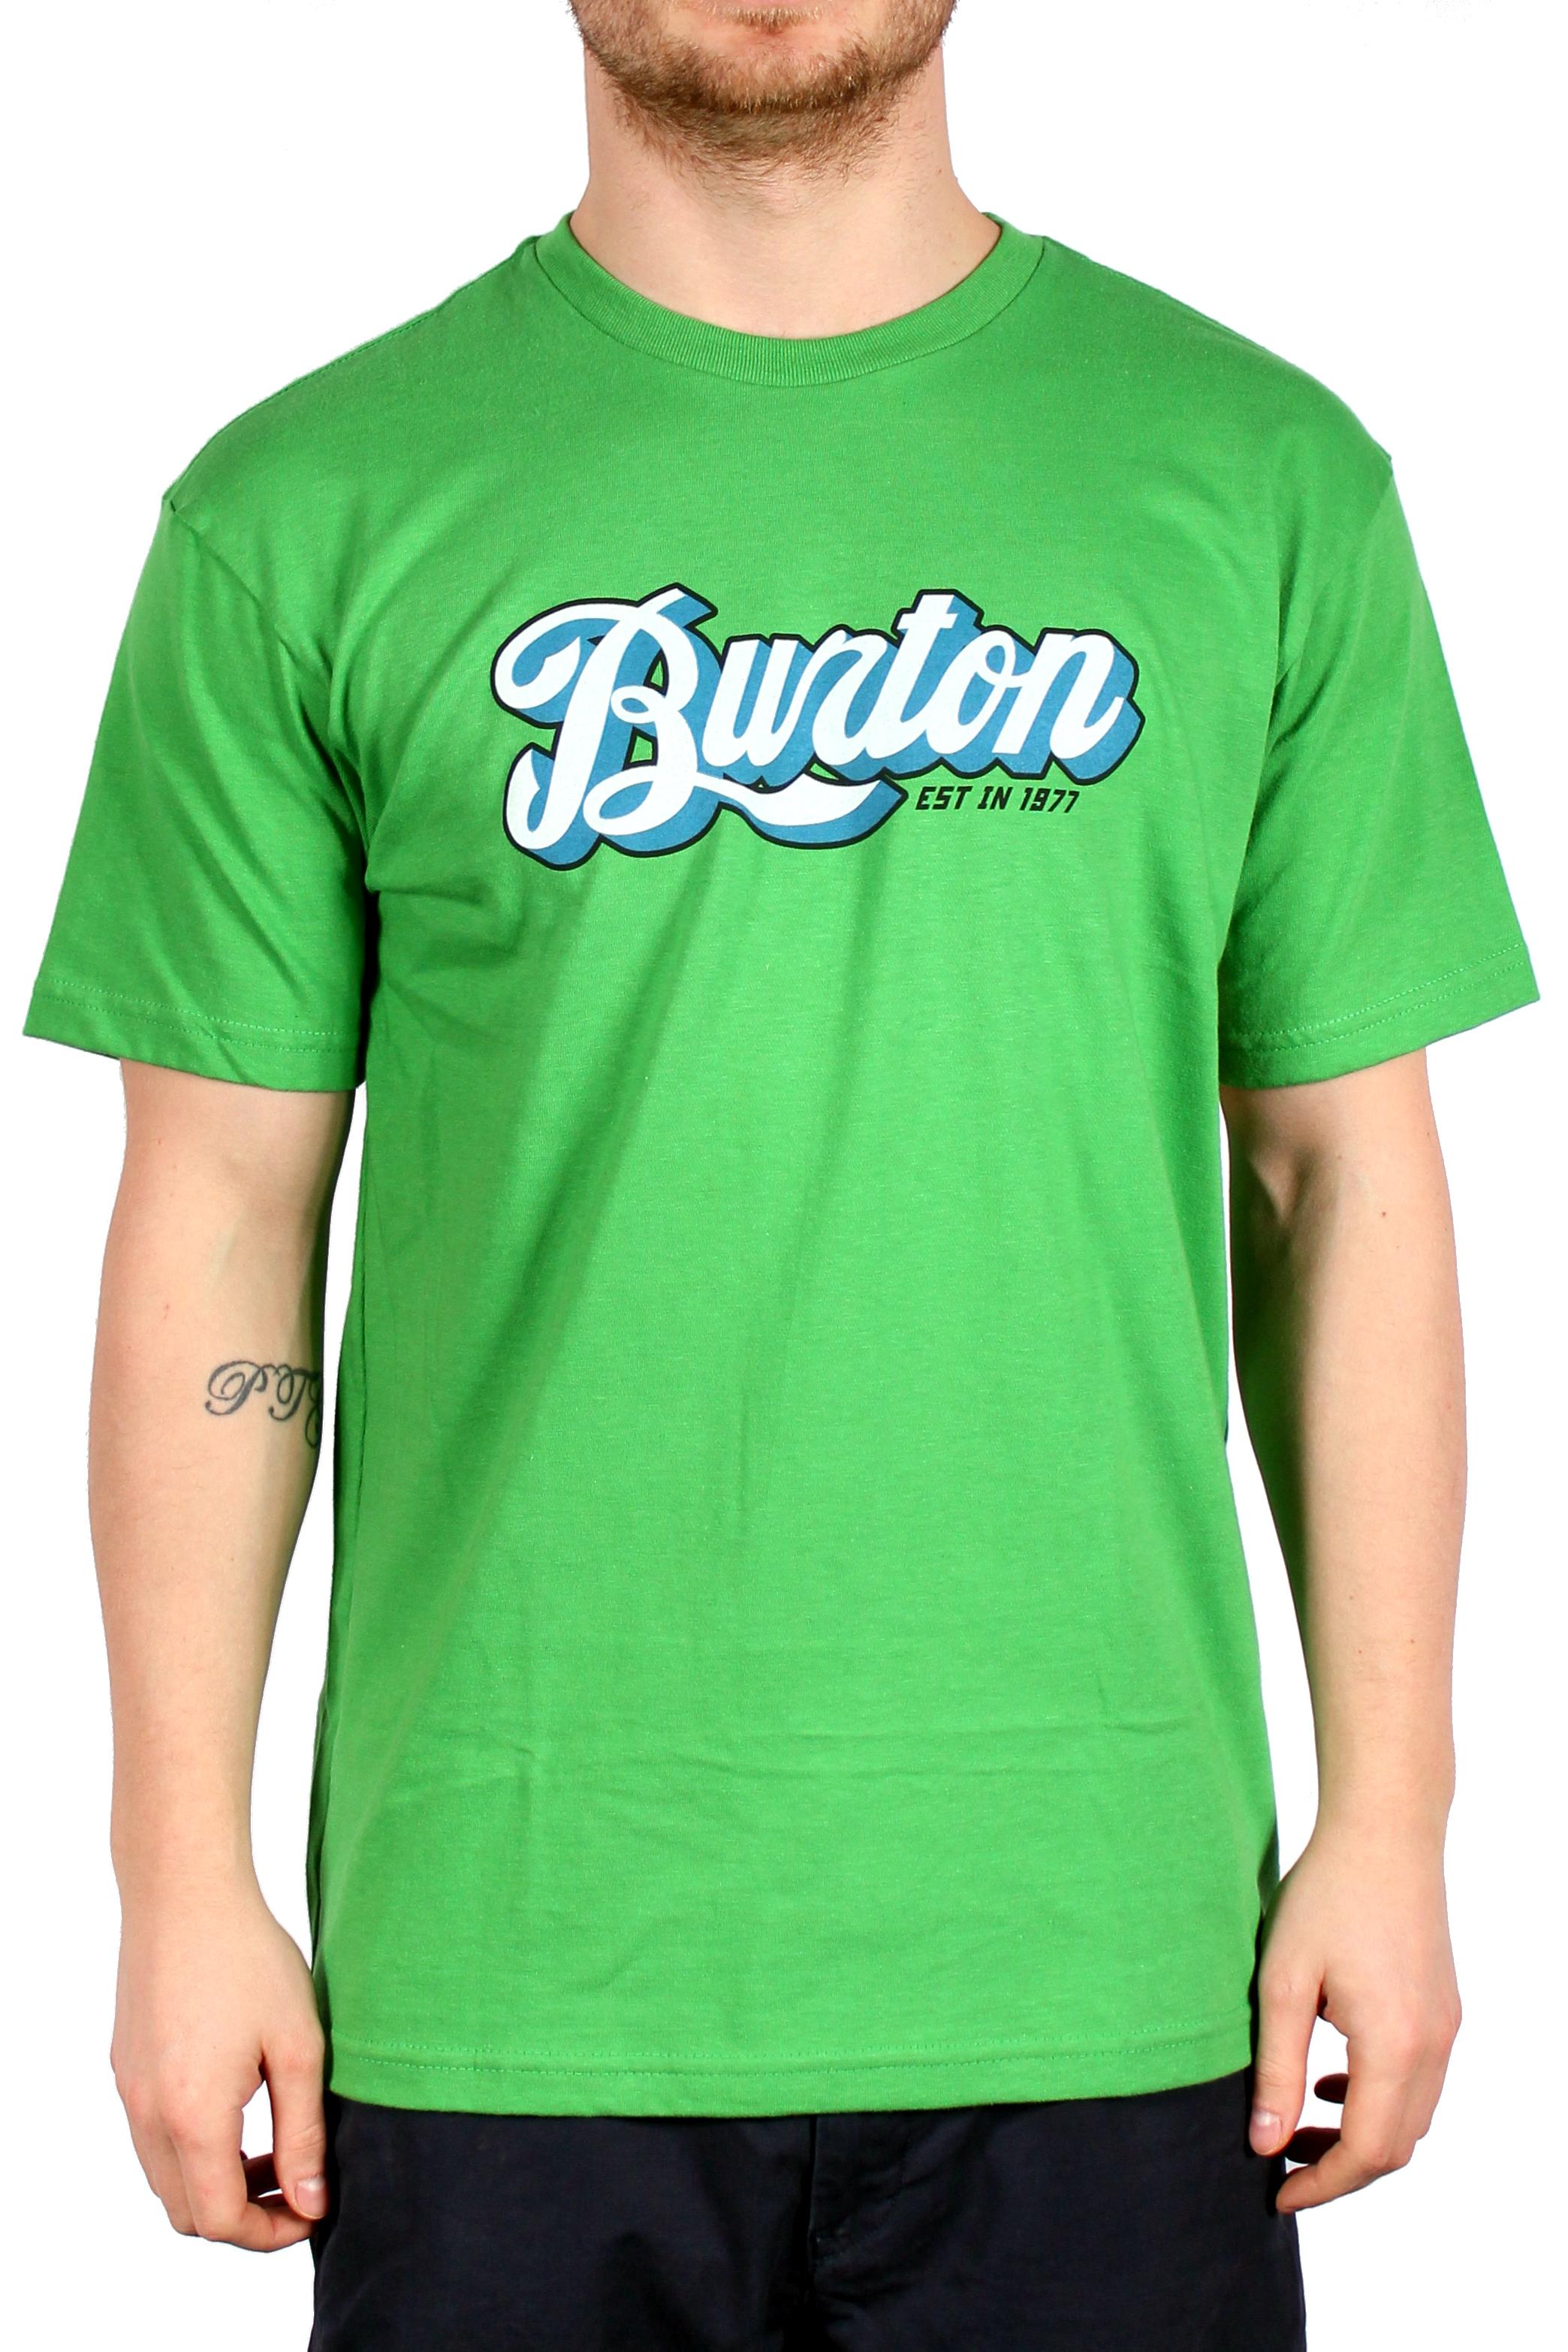 Koszulka Burton Enjoy (Acres)